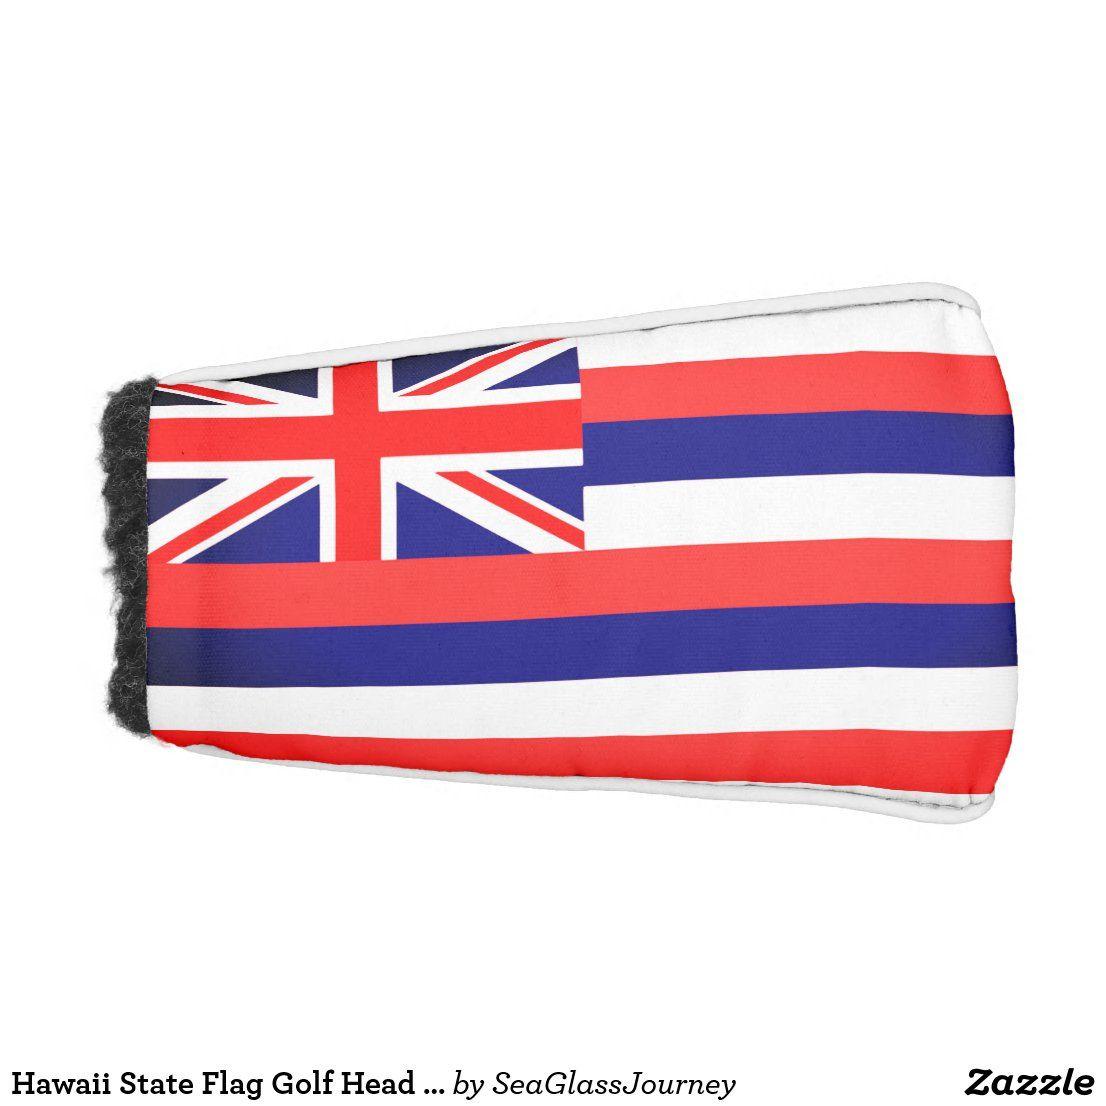 Hawaii State Flag Golf Head Cover Zazzle Com In 2020 Golf Putters Golf Head Covers Hawaii Flag